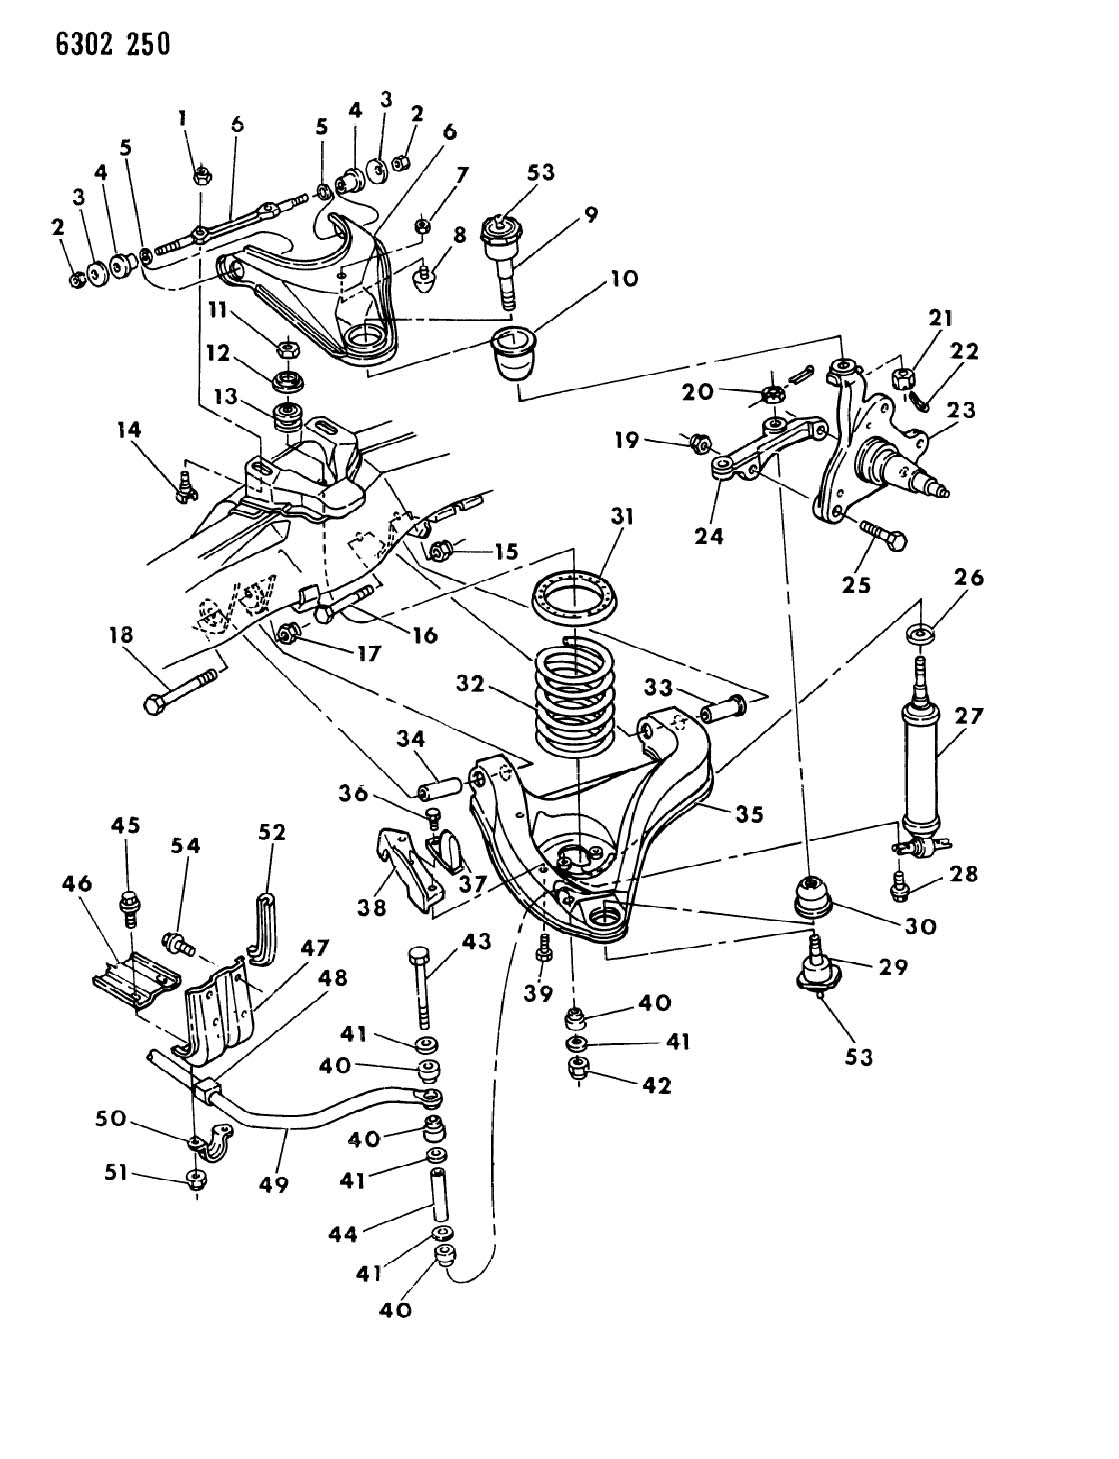 1996 Dodge Isolator, frt. Susp coil spring. 1994